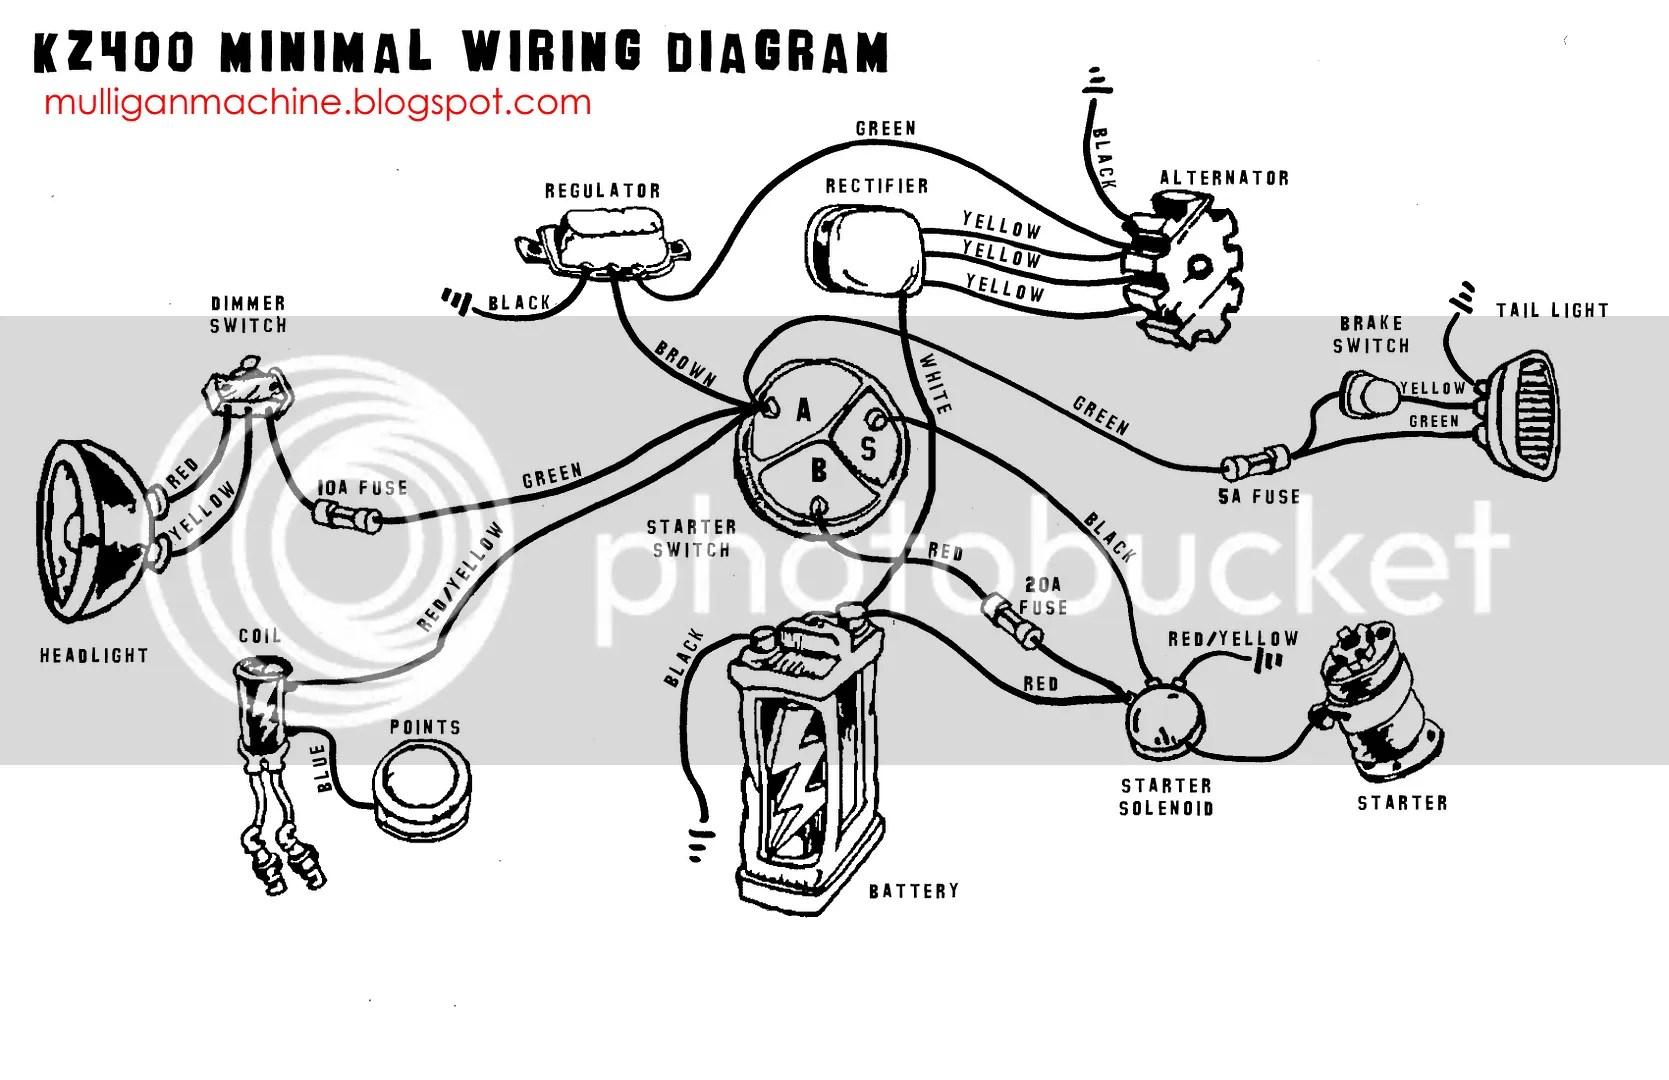 Kz400 Minimal Wiring Diagram